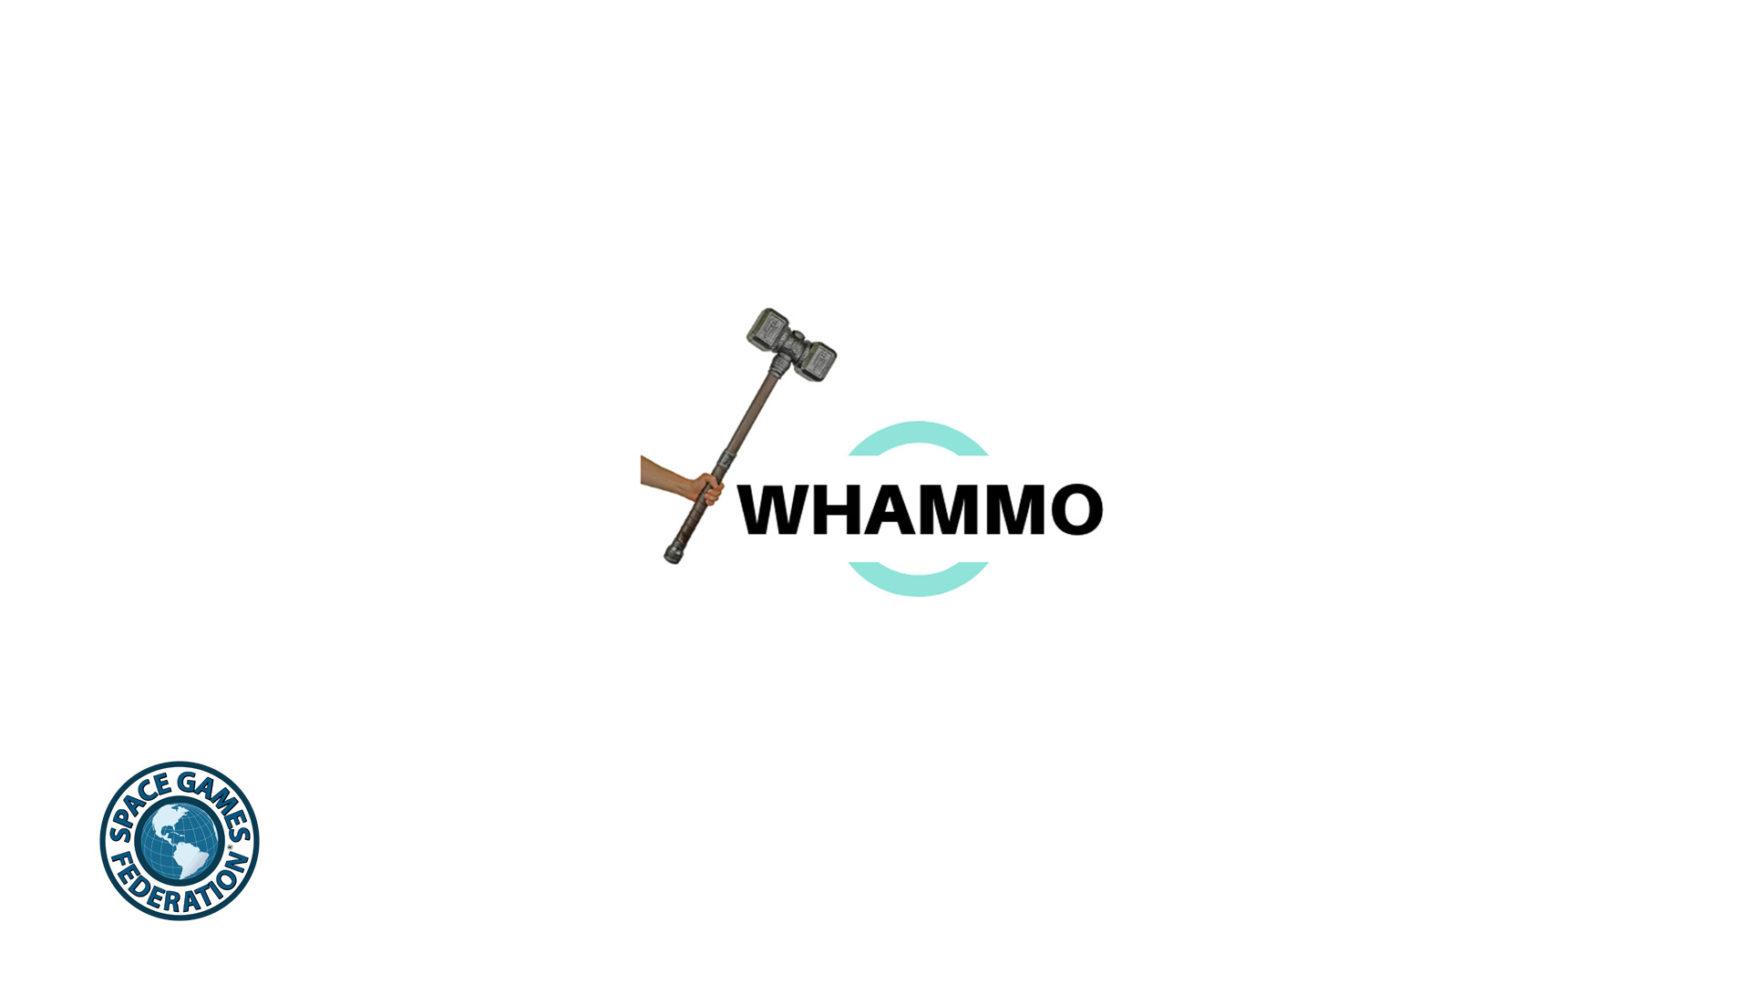 10). Whammo!